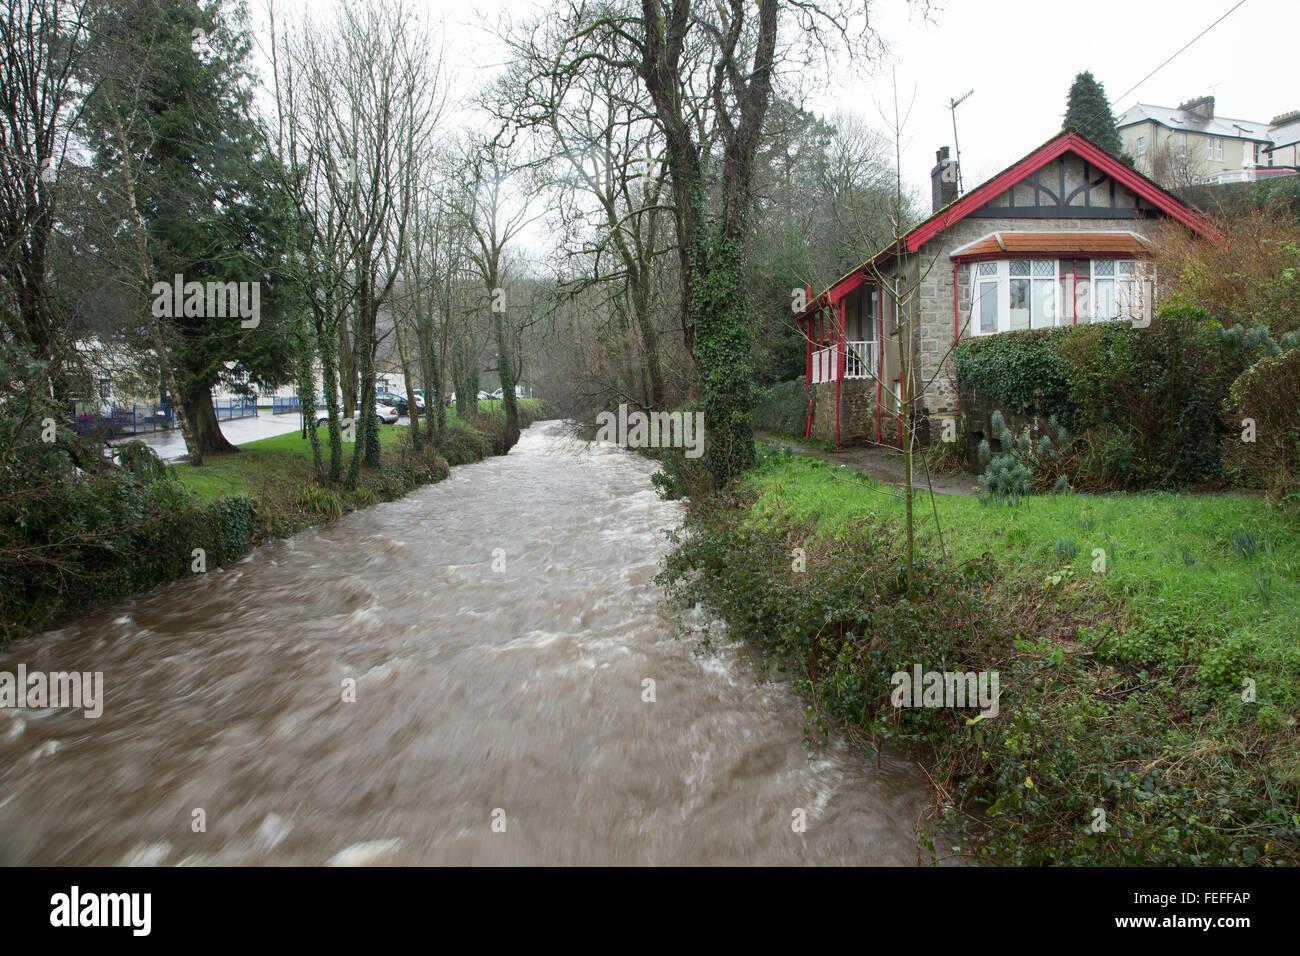 Okehampton, Devon, UK. 6th February, 2016. High river levels at Simmons Park in Okehampton during storm Credit: Stock Photo